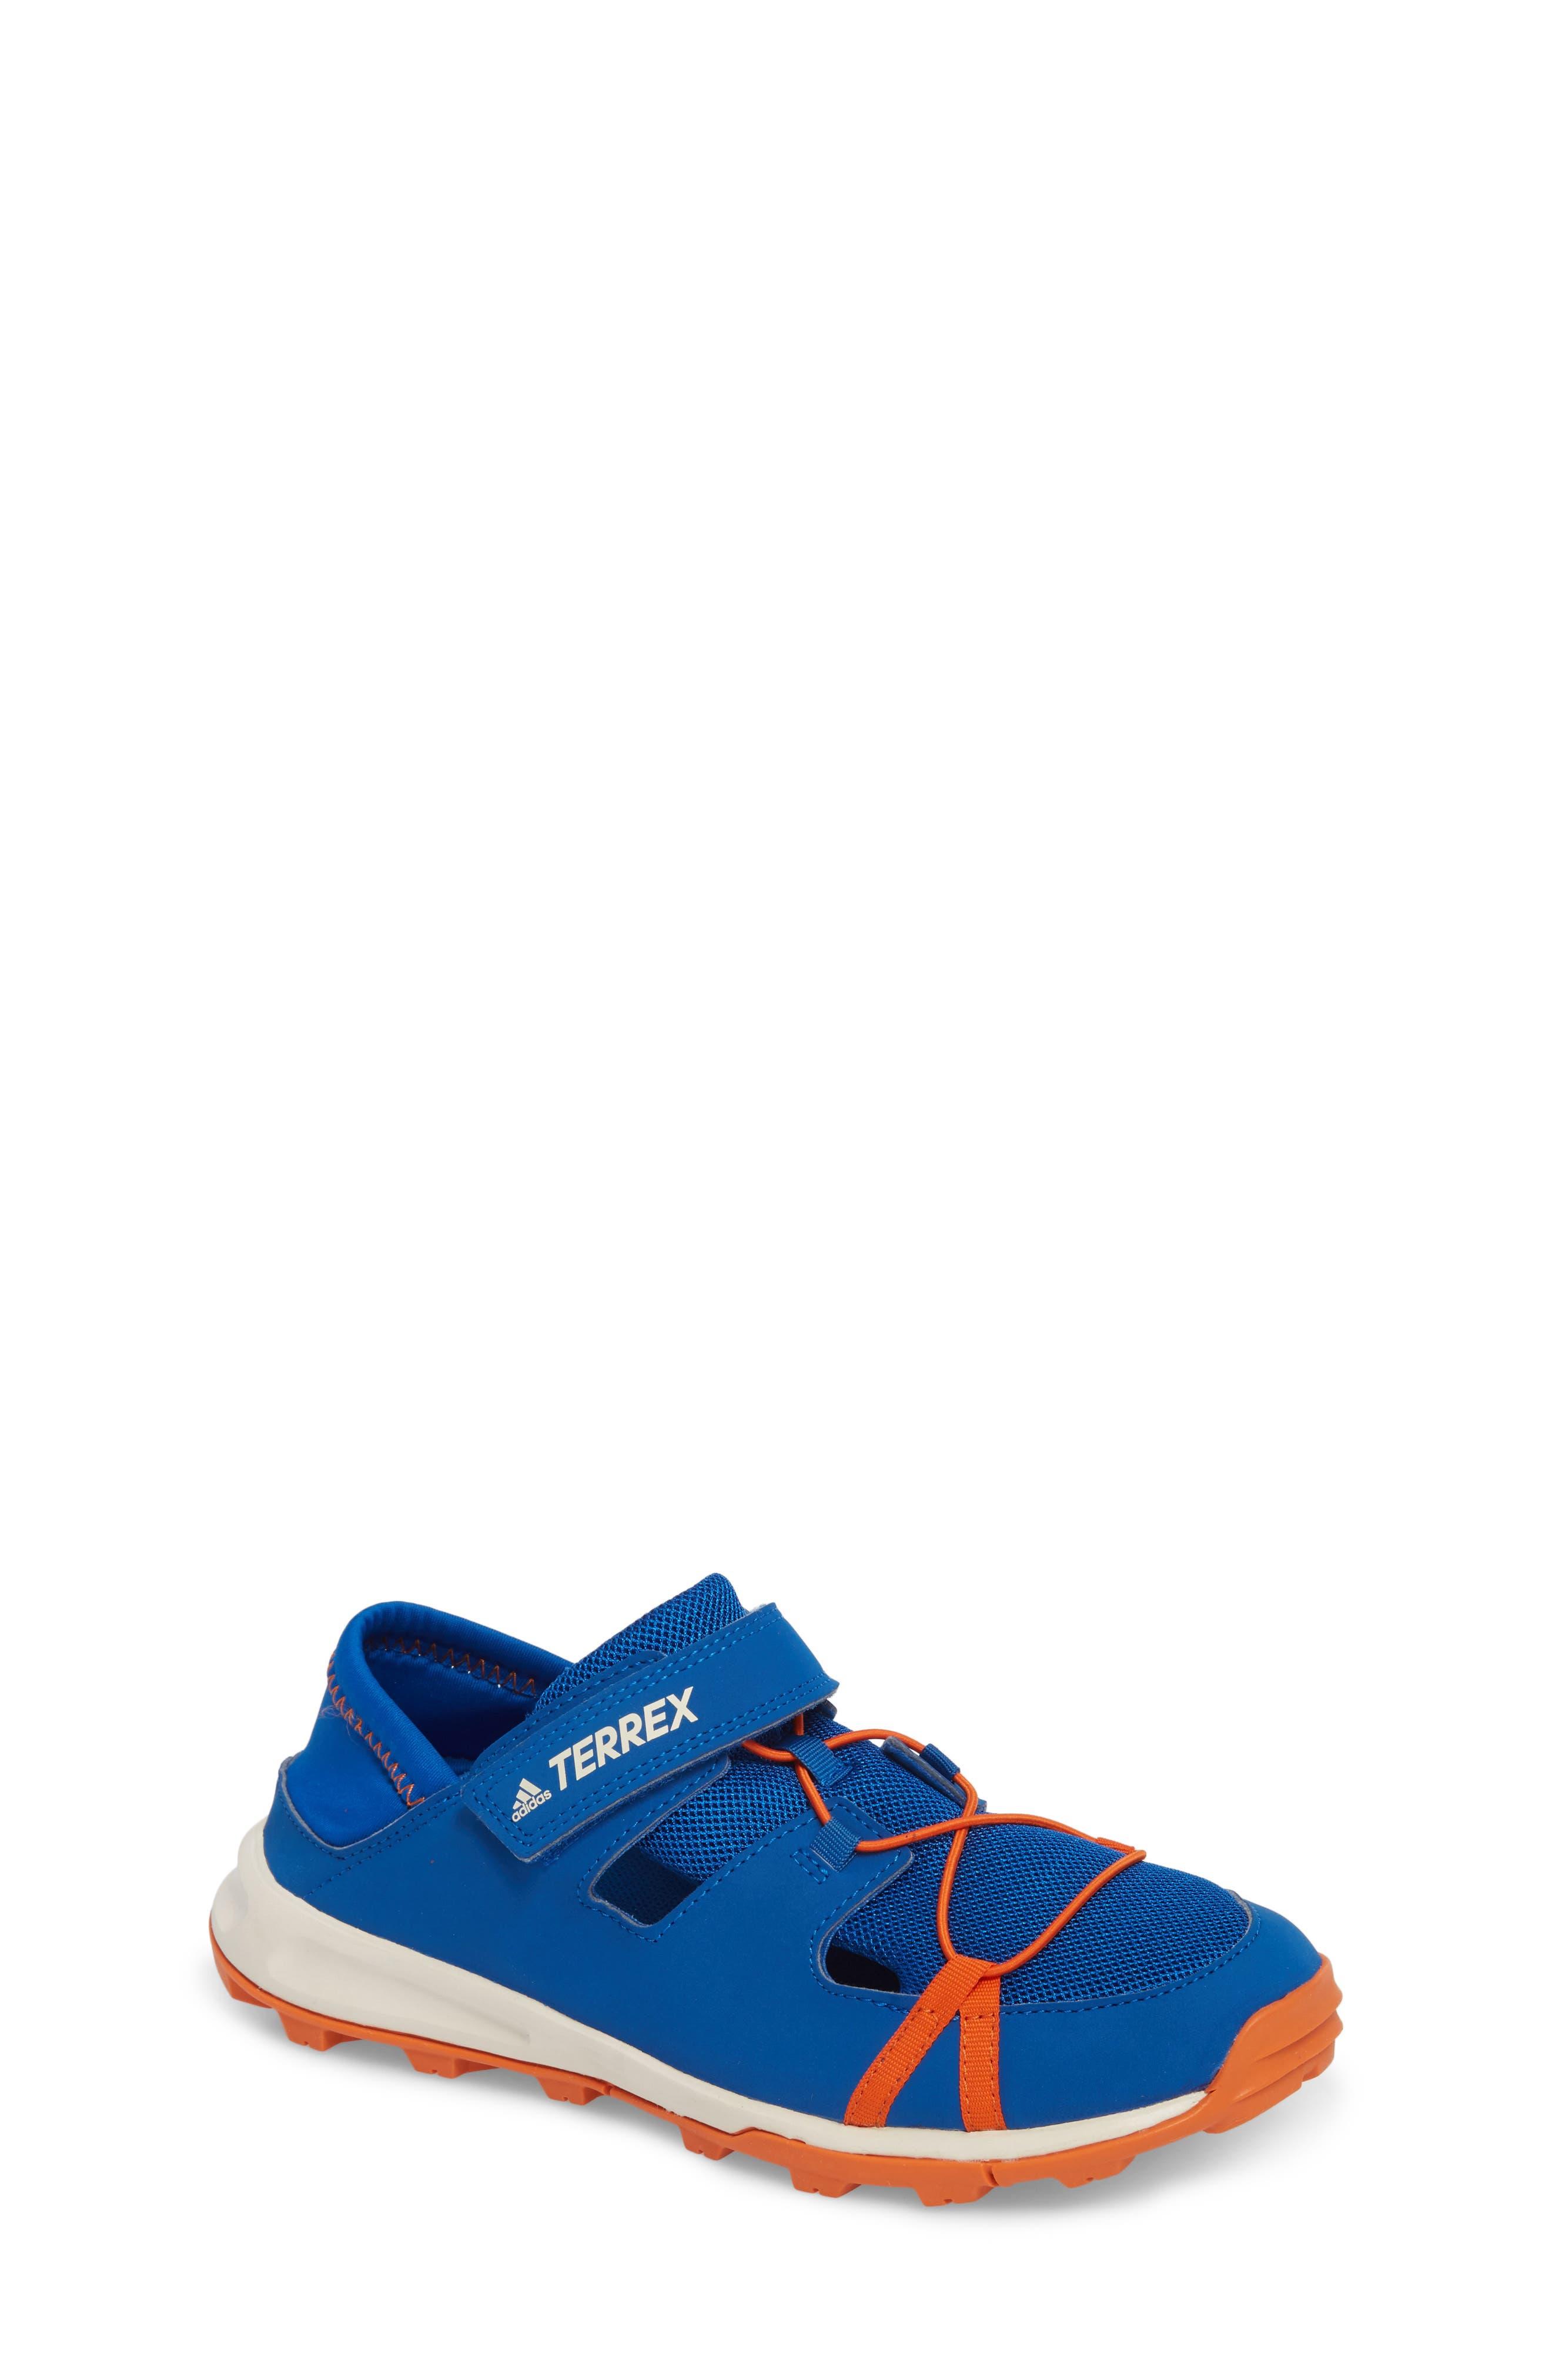 Terrex Tivid Sneaker,                             Main thumbnail 1, color,                             Blue/ Orange/ Chalk White